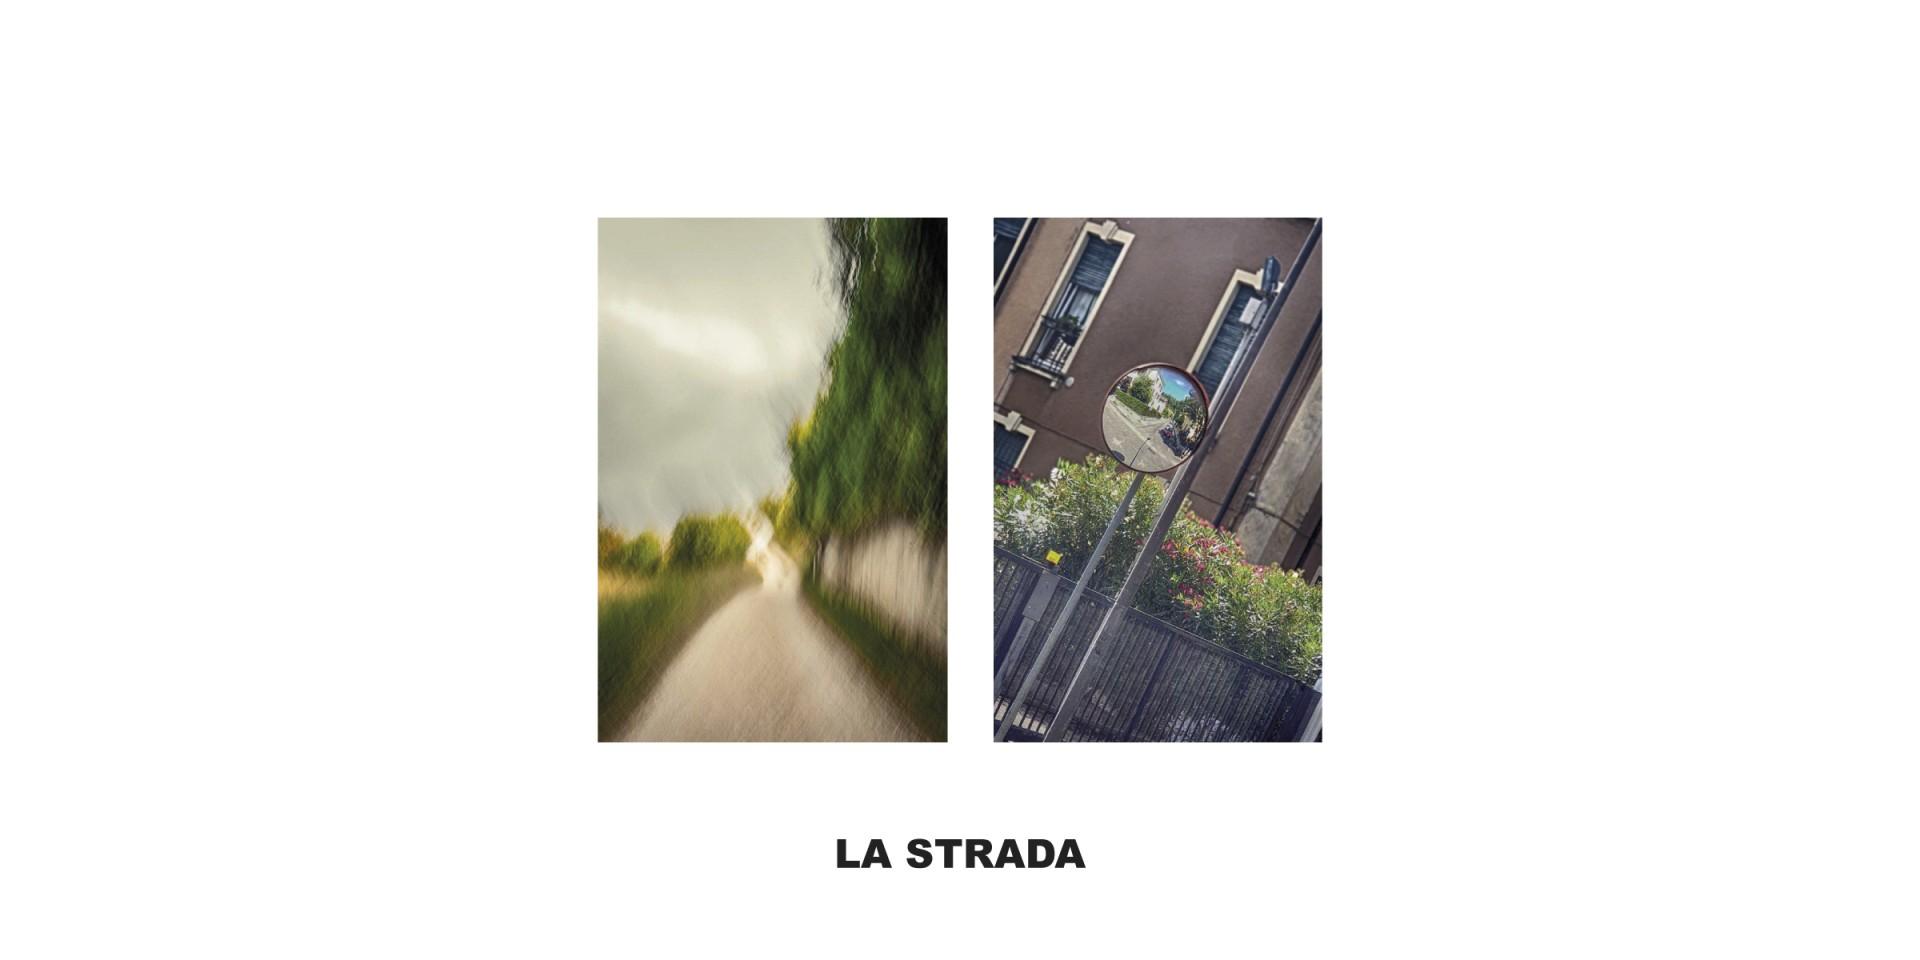 01-slide-la-strada-7.jpg